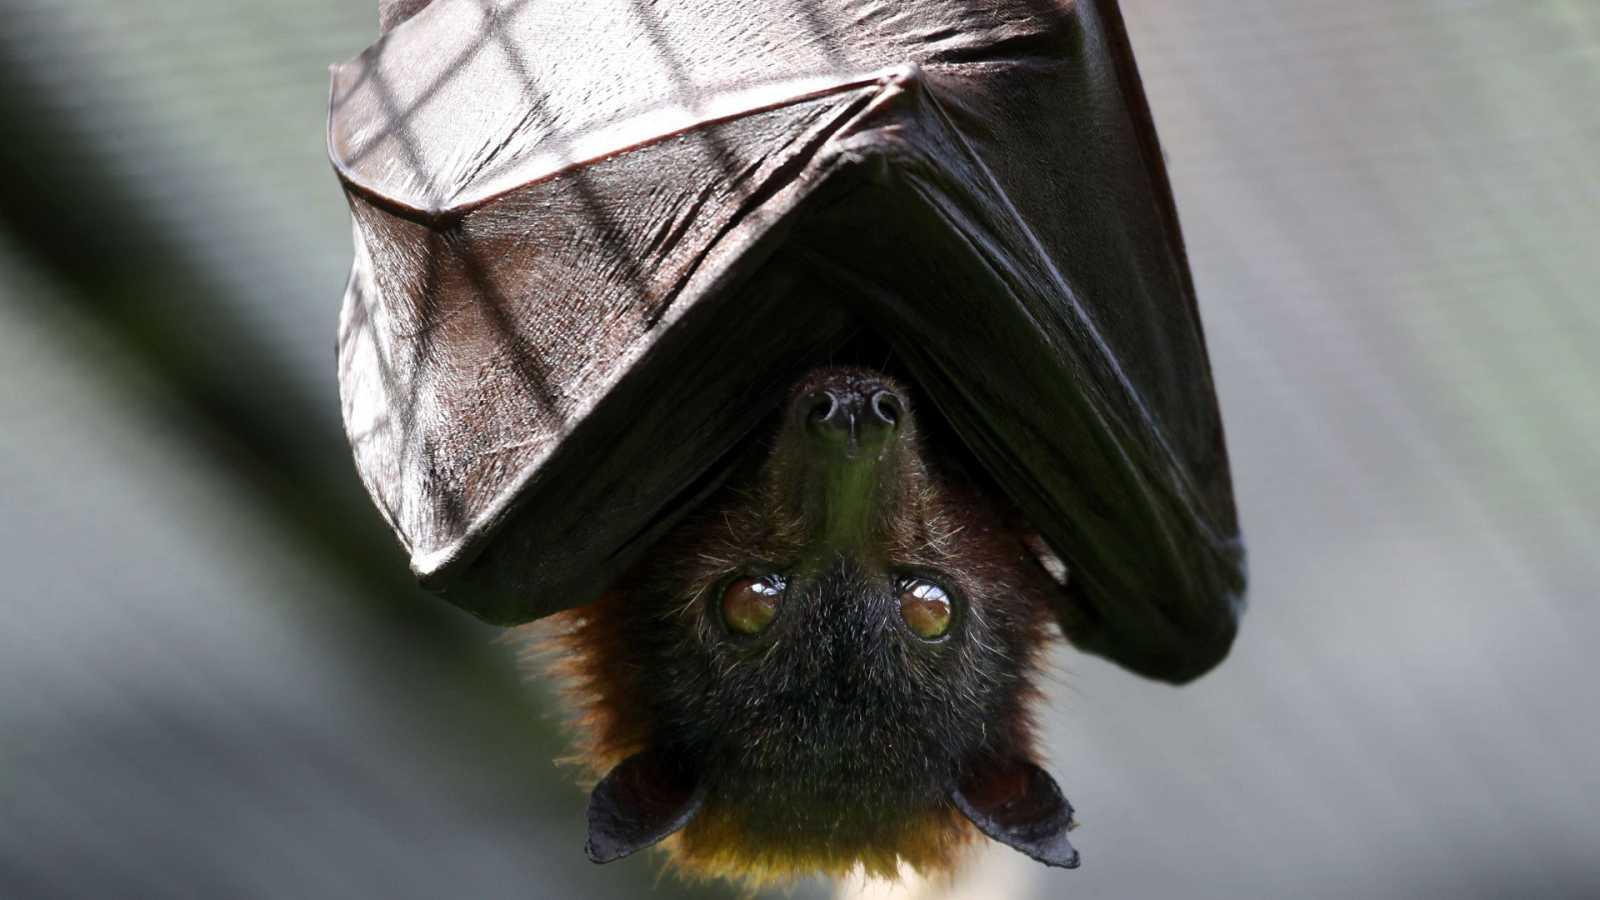 Murciélago de la fruta, zoo de Oakland, California, EE.UU.